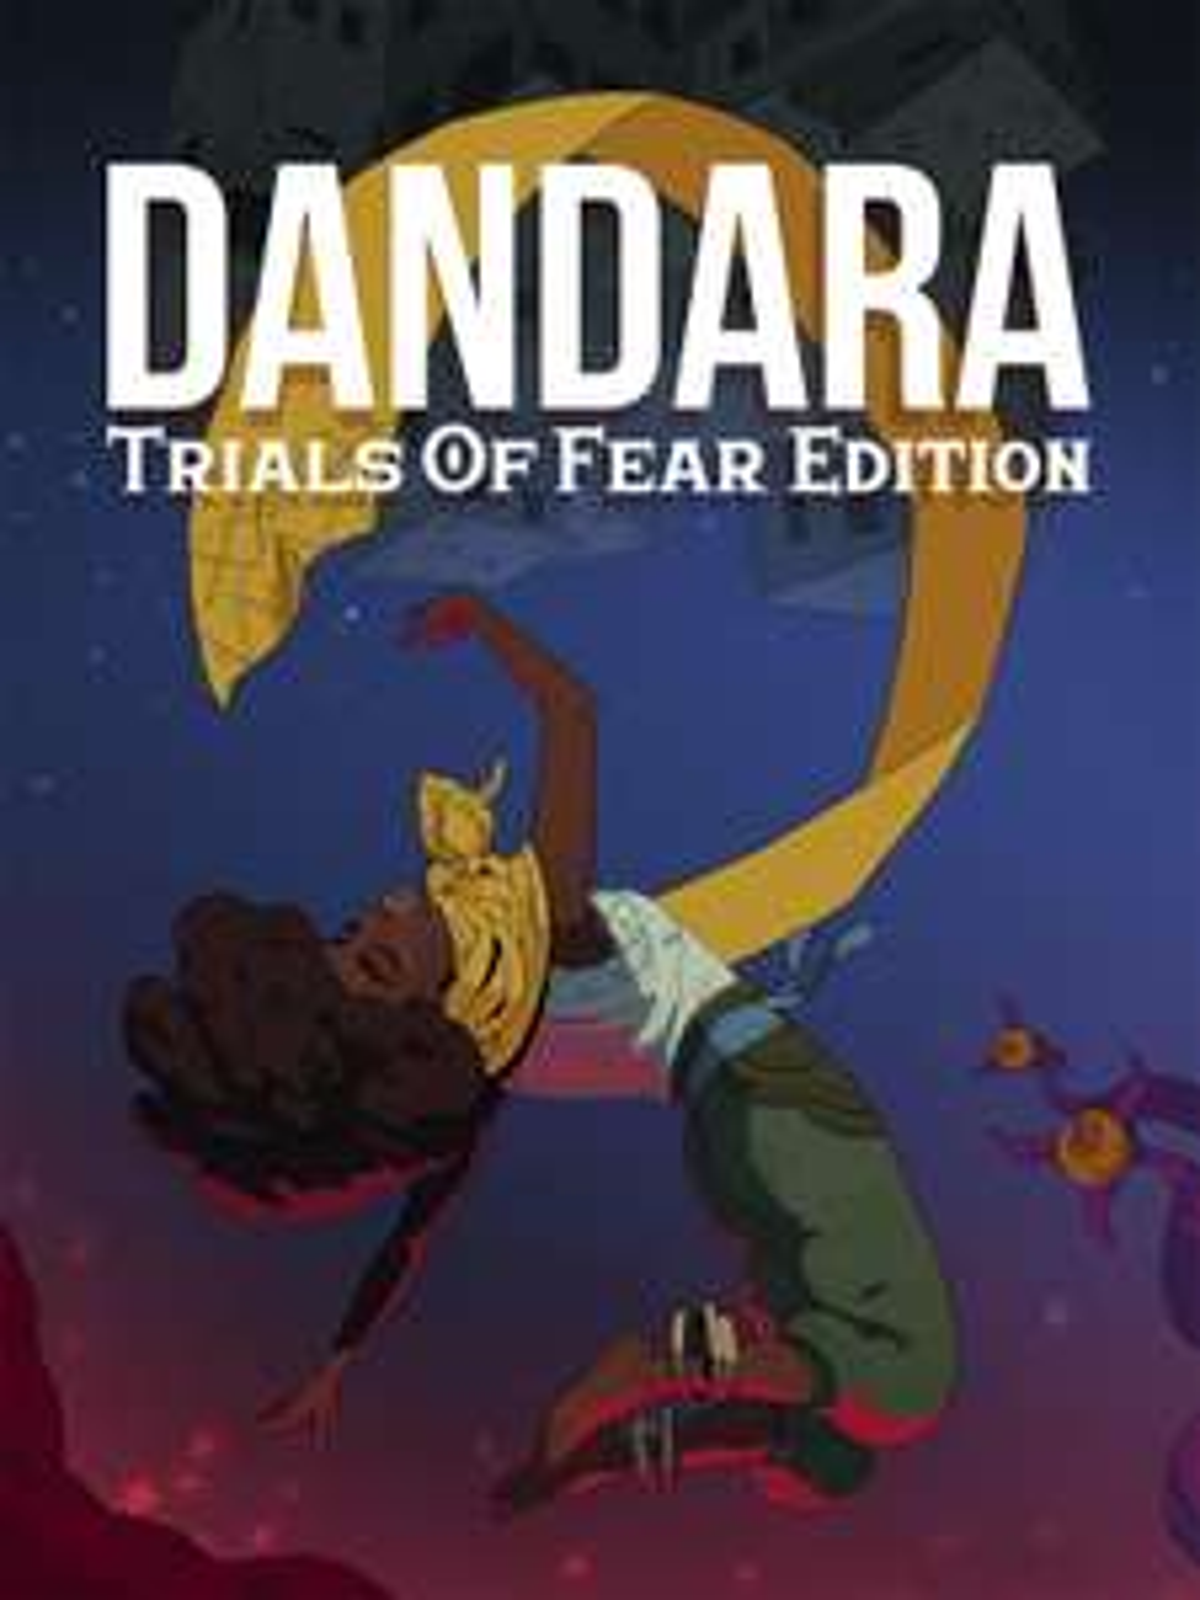 [Gratis] Dandara: Trials of Fear Edition @Epic games